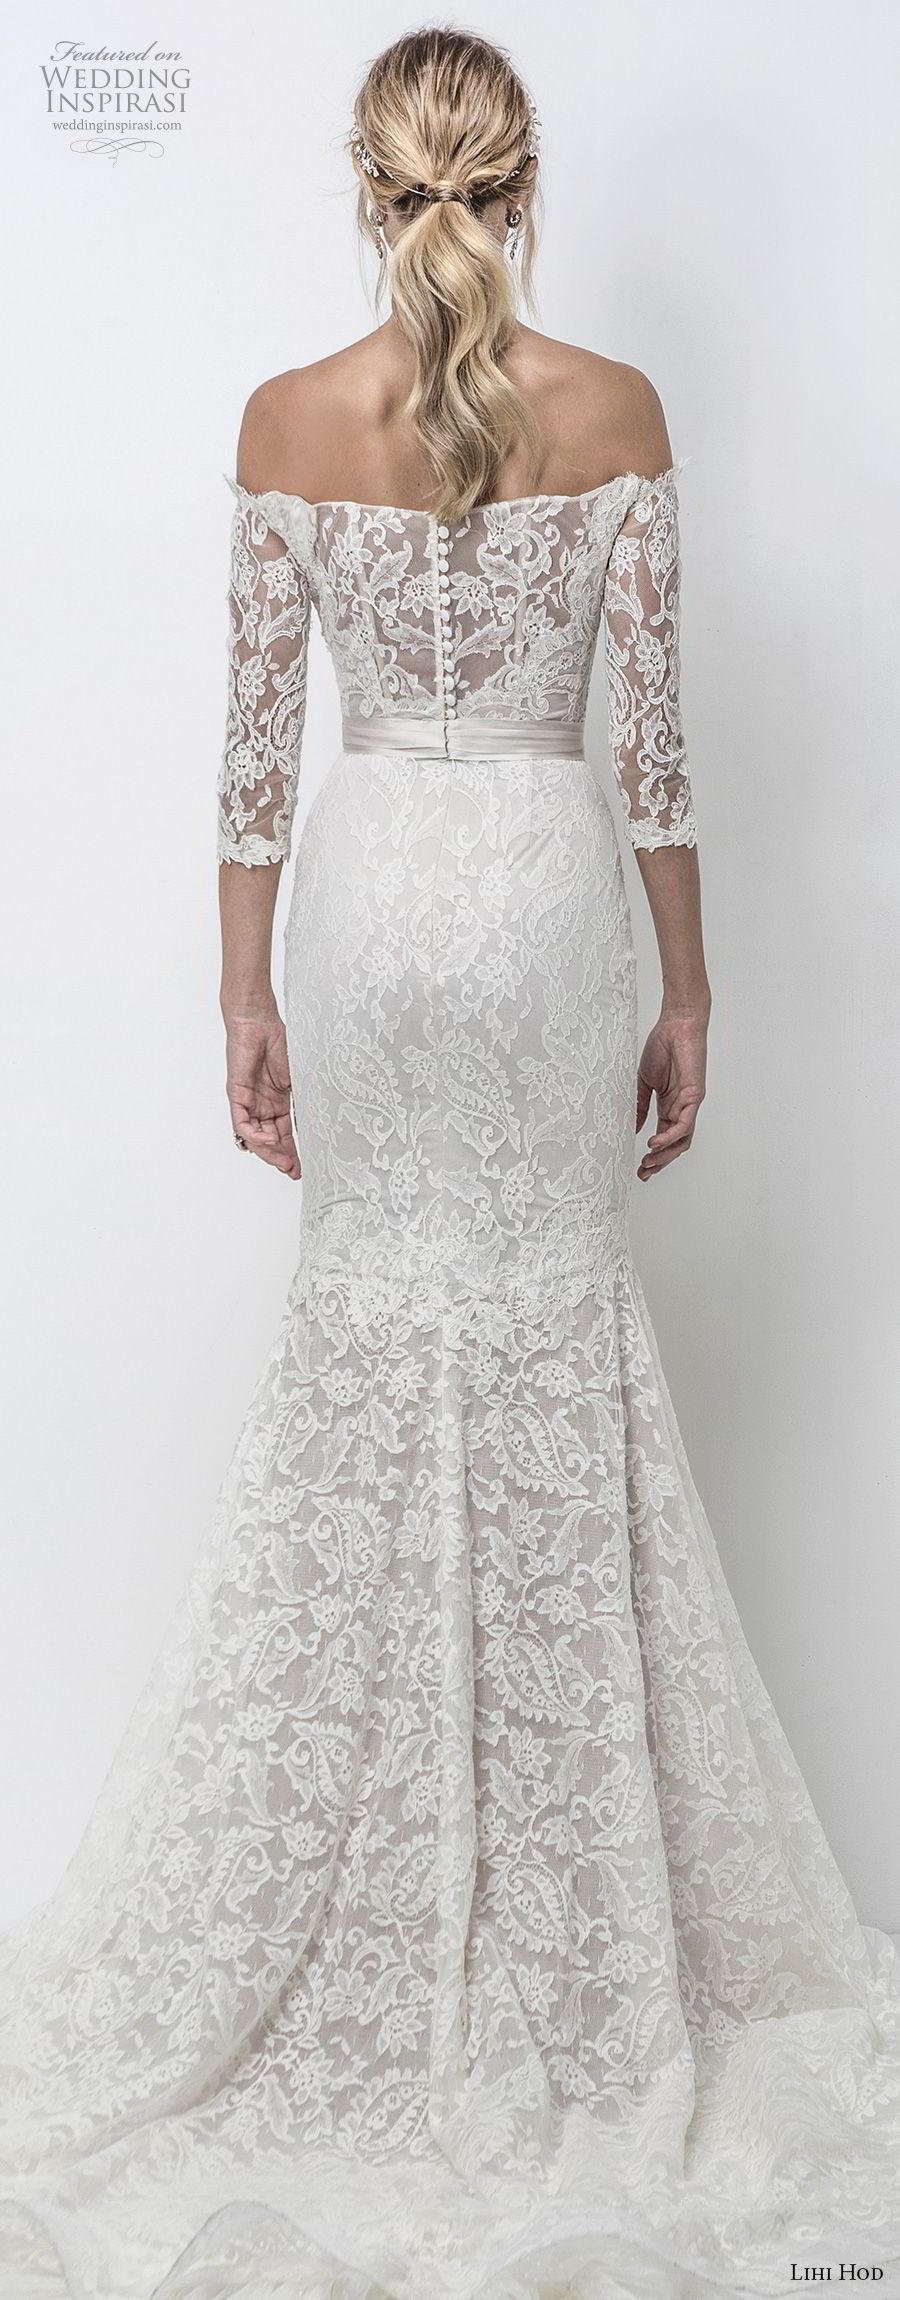 lihi hod 2018 bridal three quarter sleeves off the shoulder straight across neckline full embellishment elegant fit and flare mermaid wedding dress chapel train (10) bv